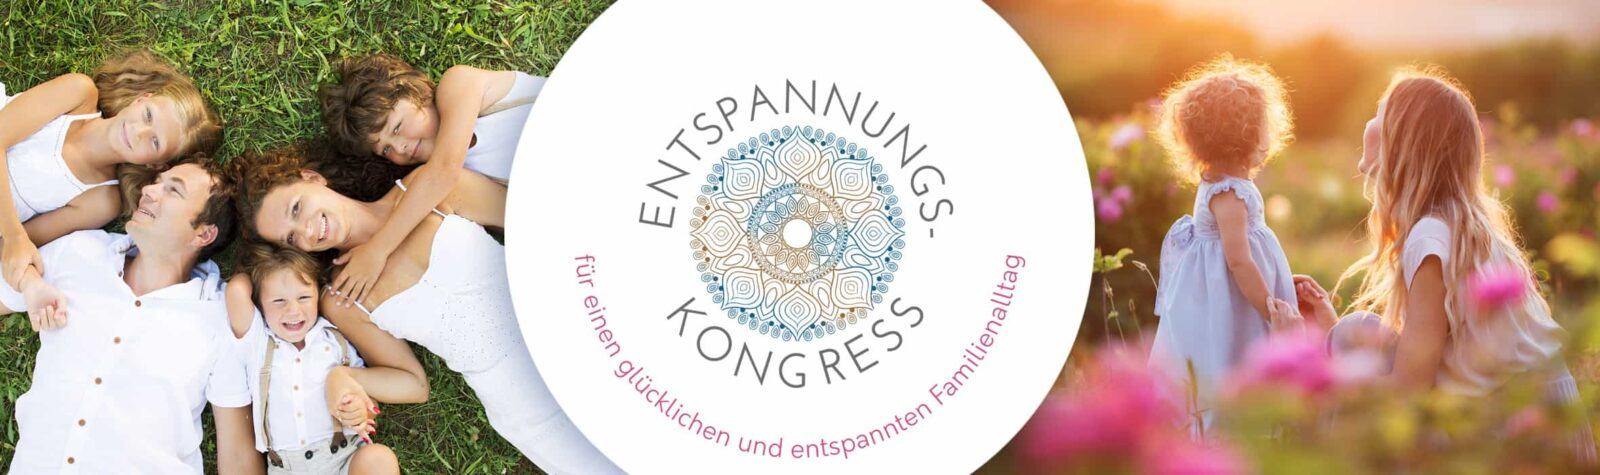 Entspannungs-Kongress-Online-kongress-Empfehlungen Juni 2018